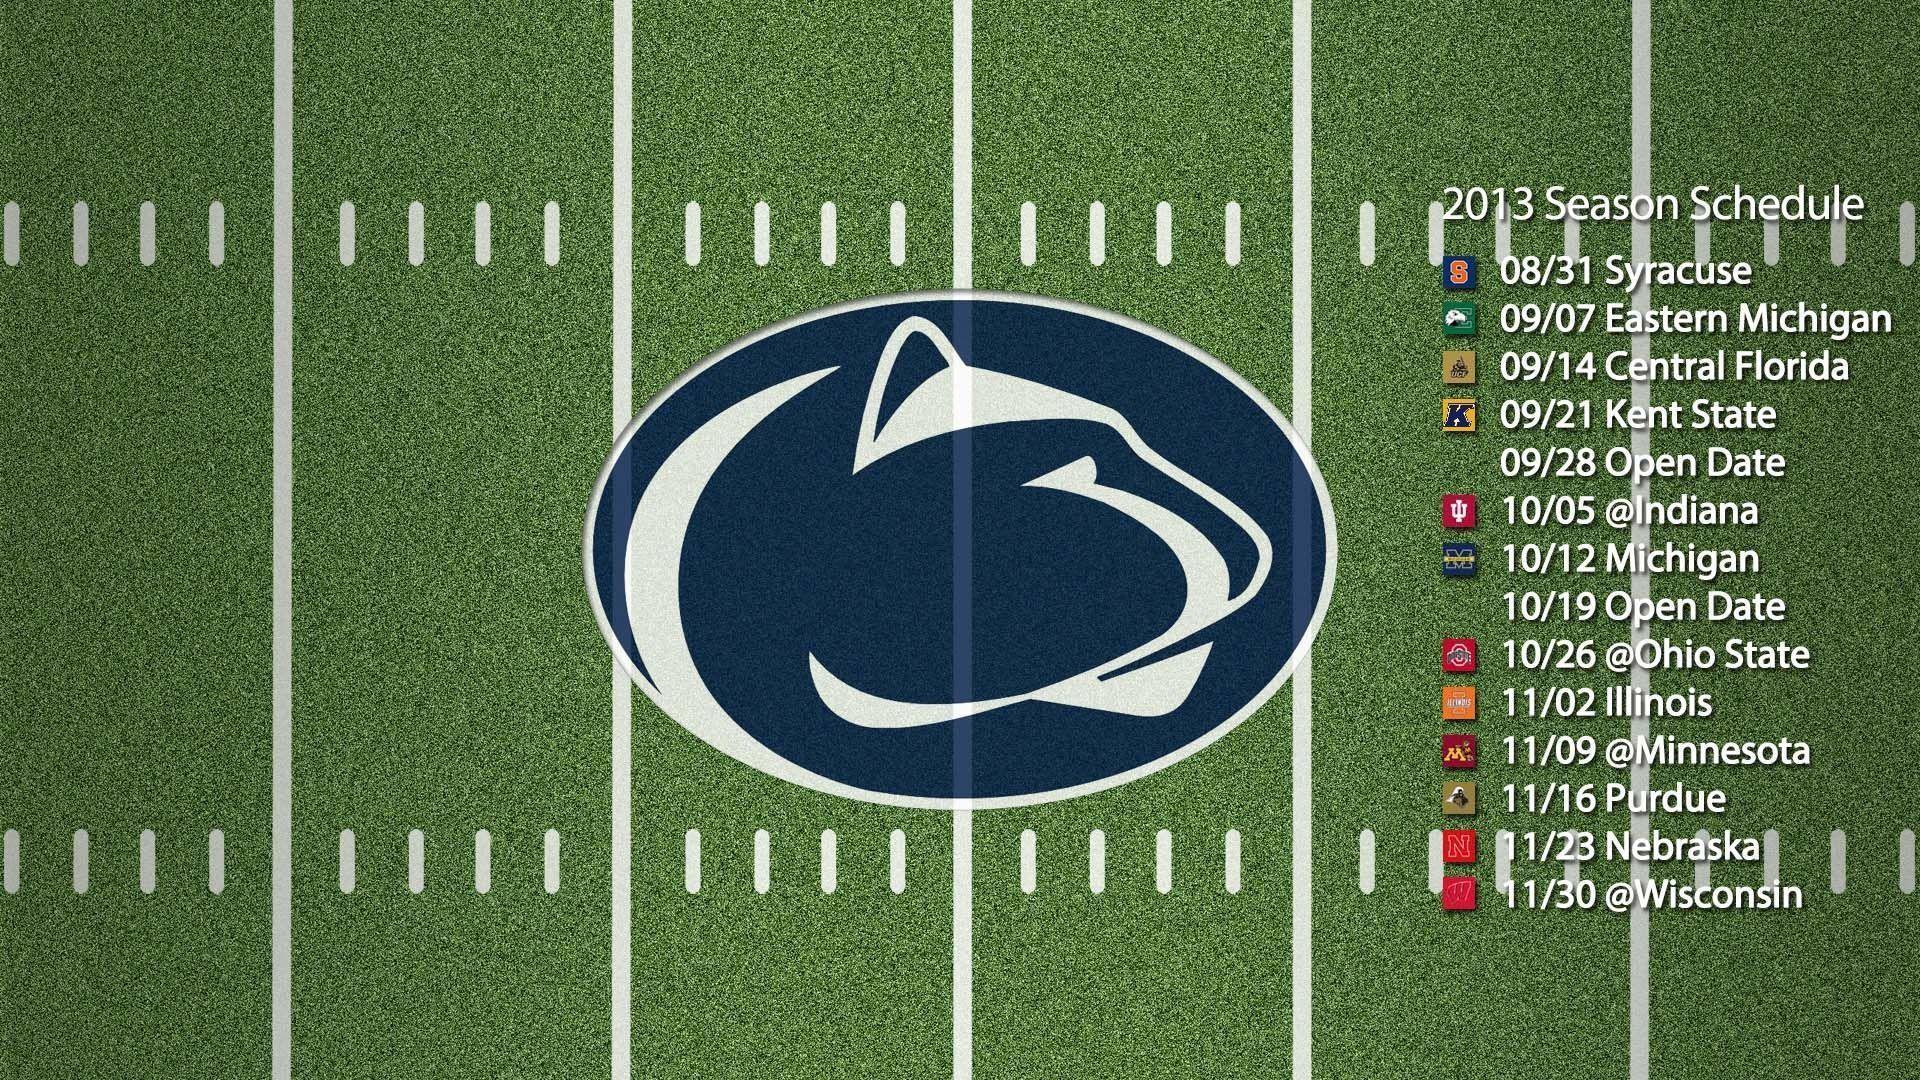 Penn State Desktop Wallpaper